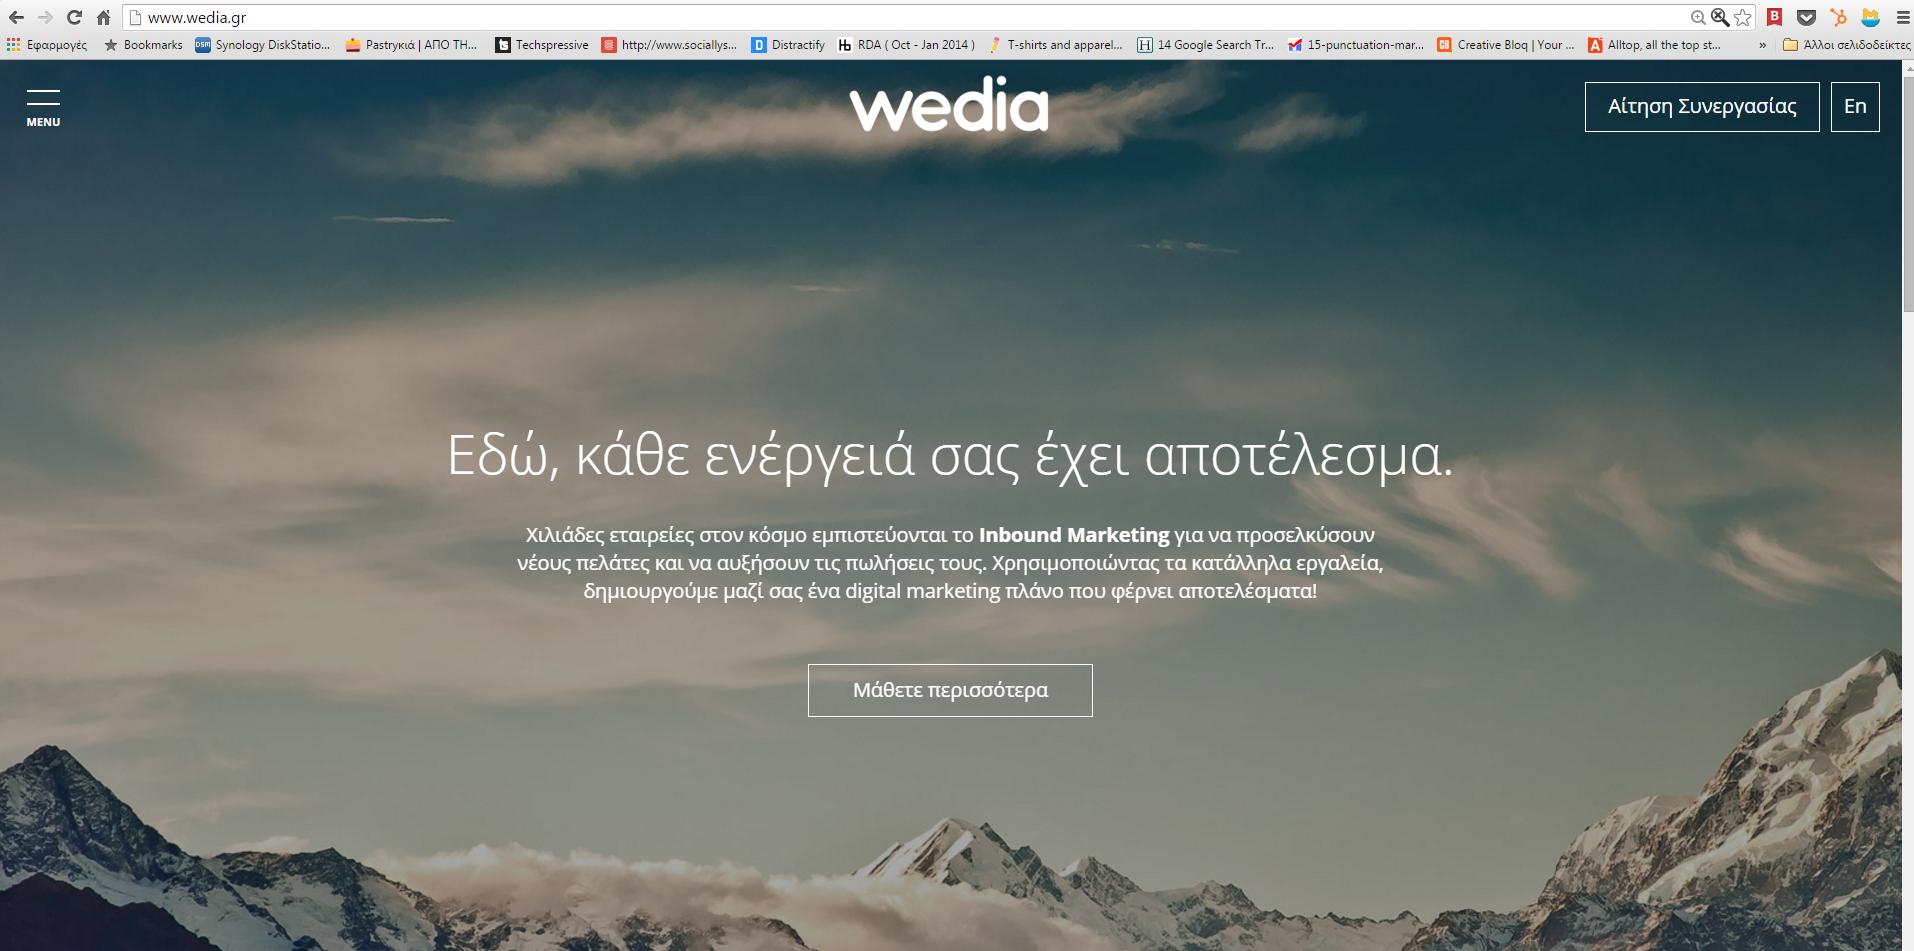 Wed design - Hero Images